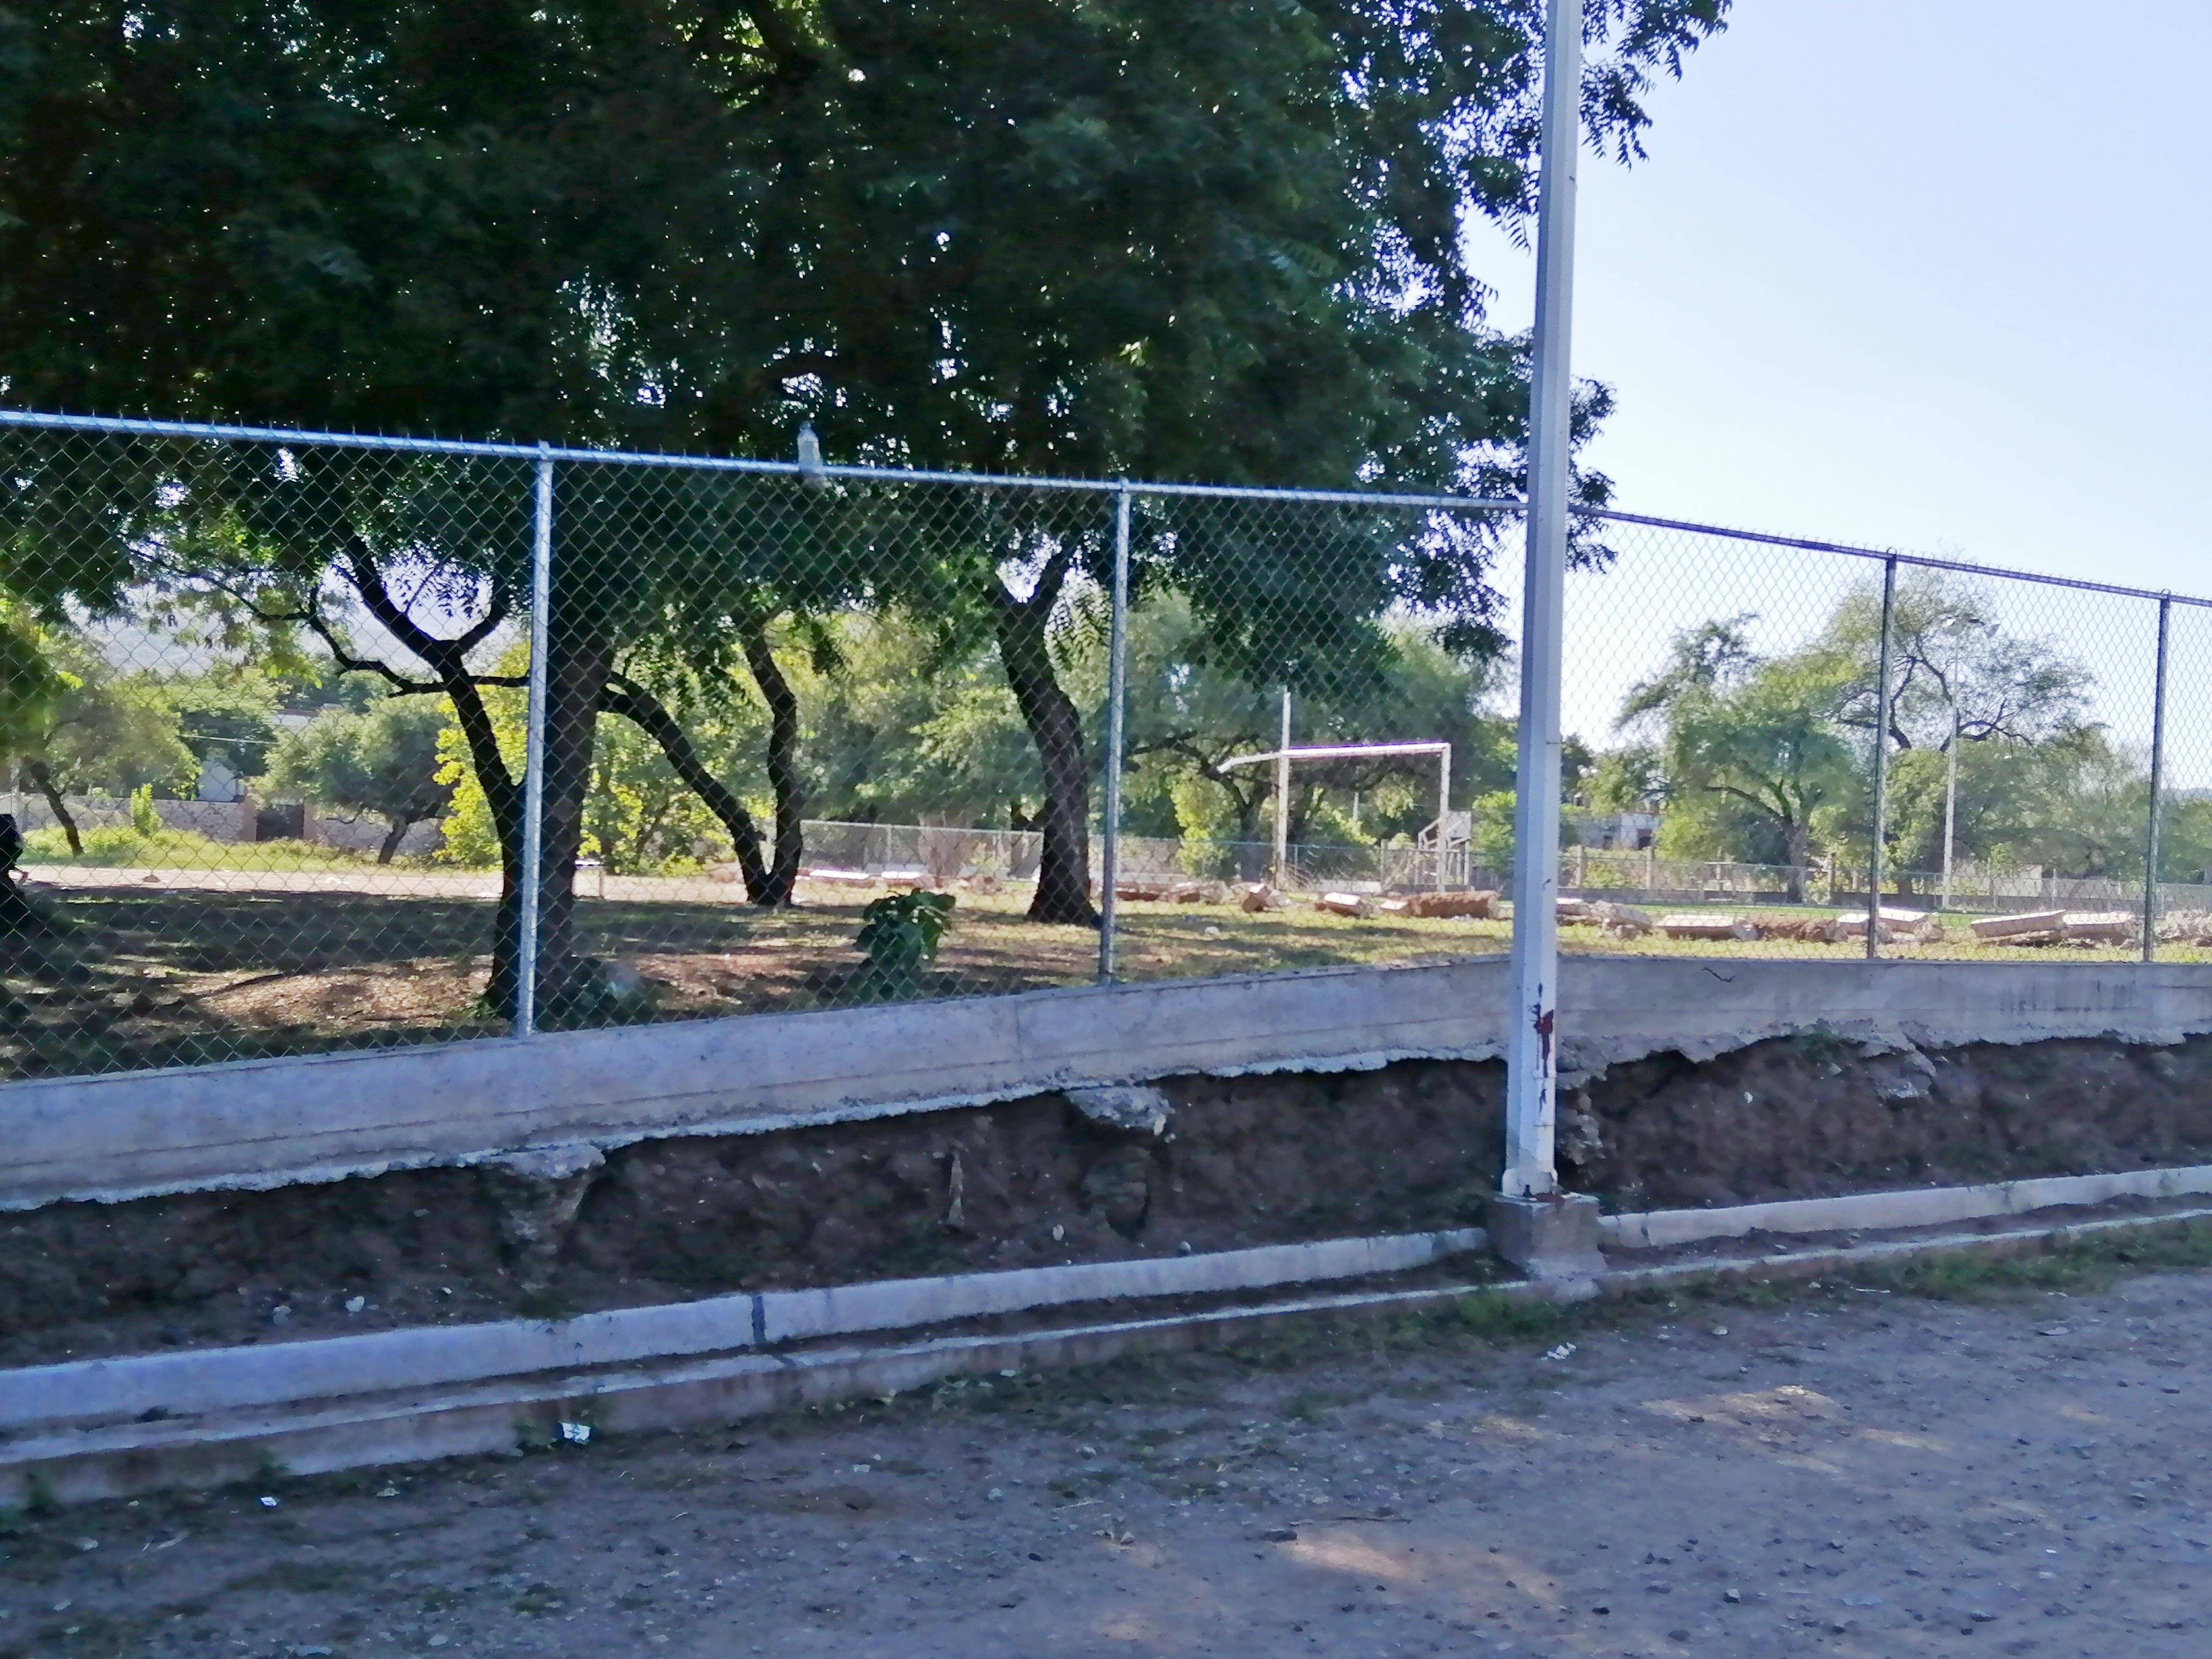 Conalep de Cananea, Fondo Minero, Sonora.